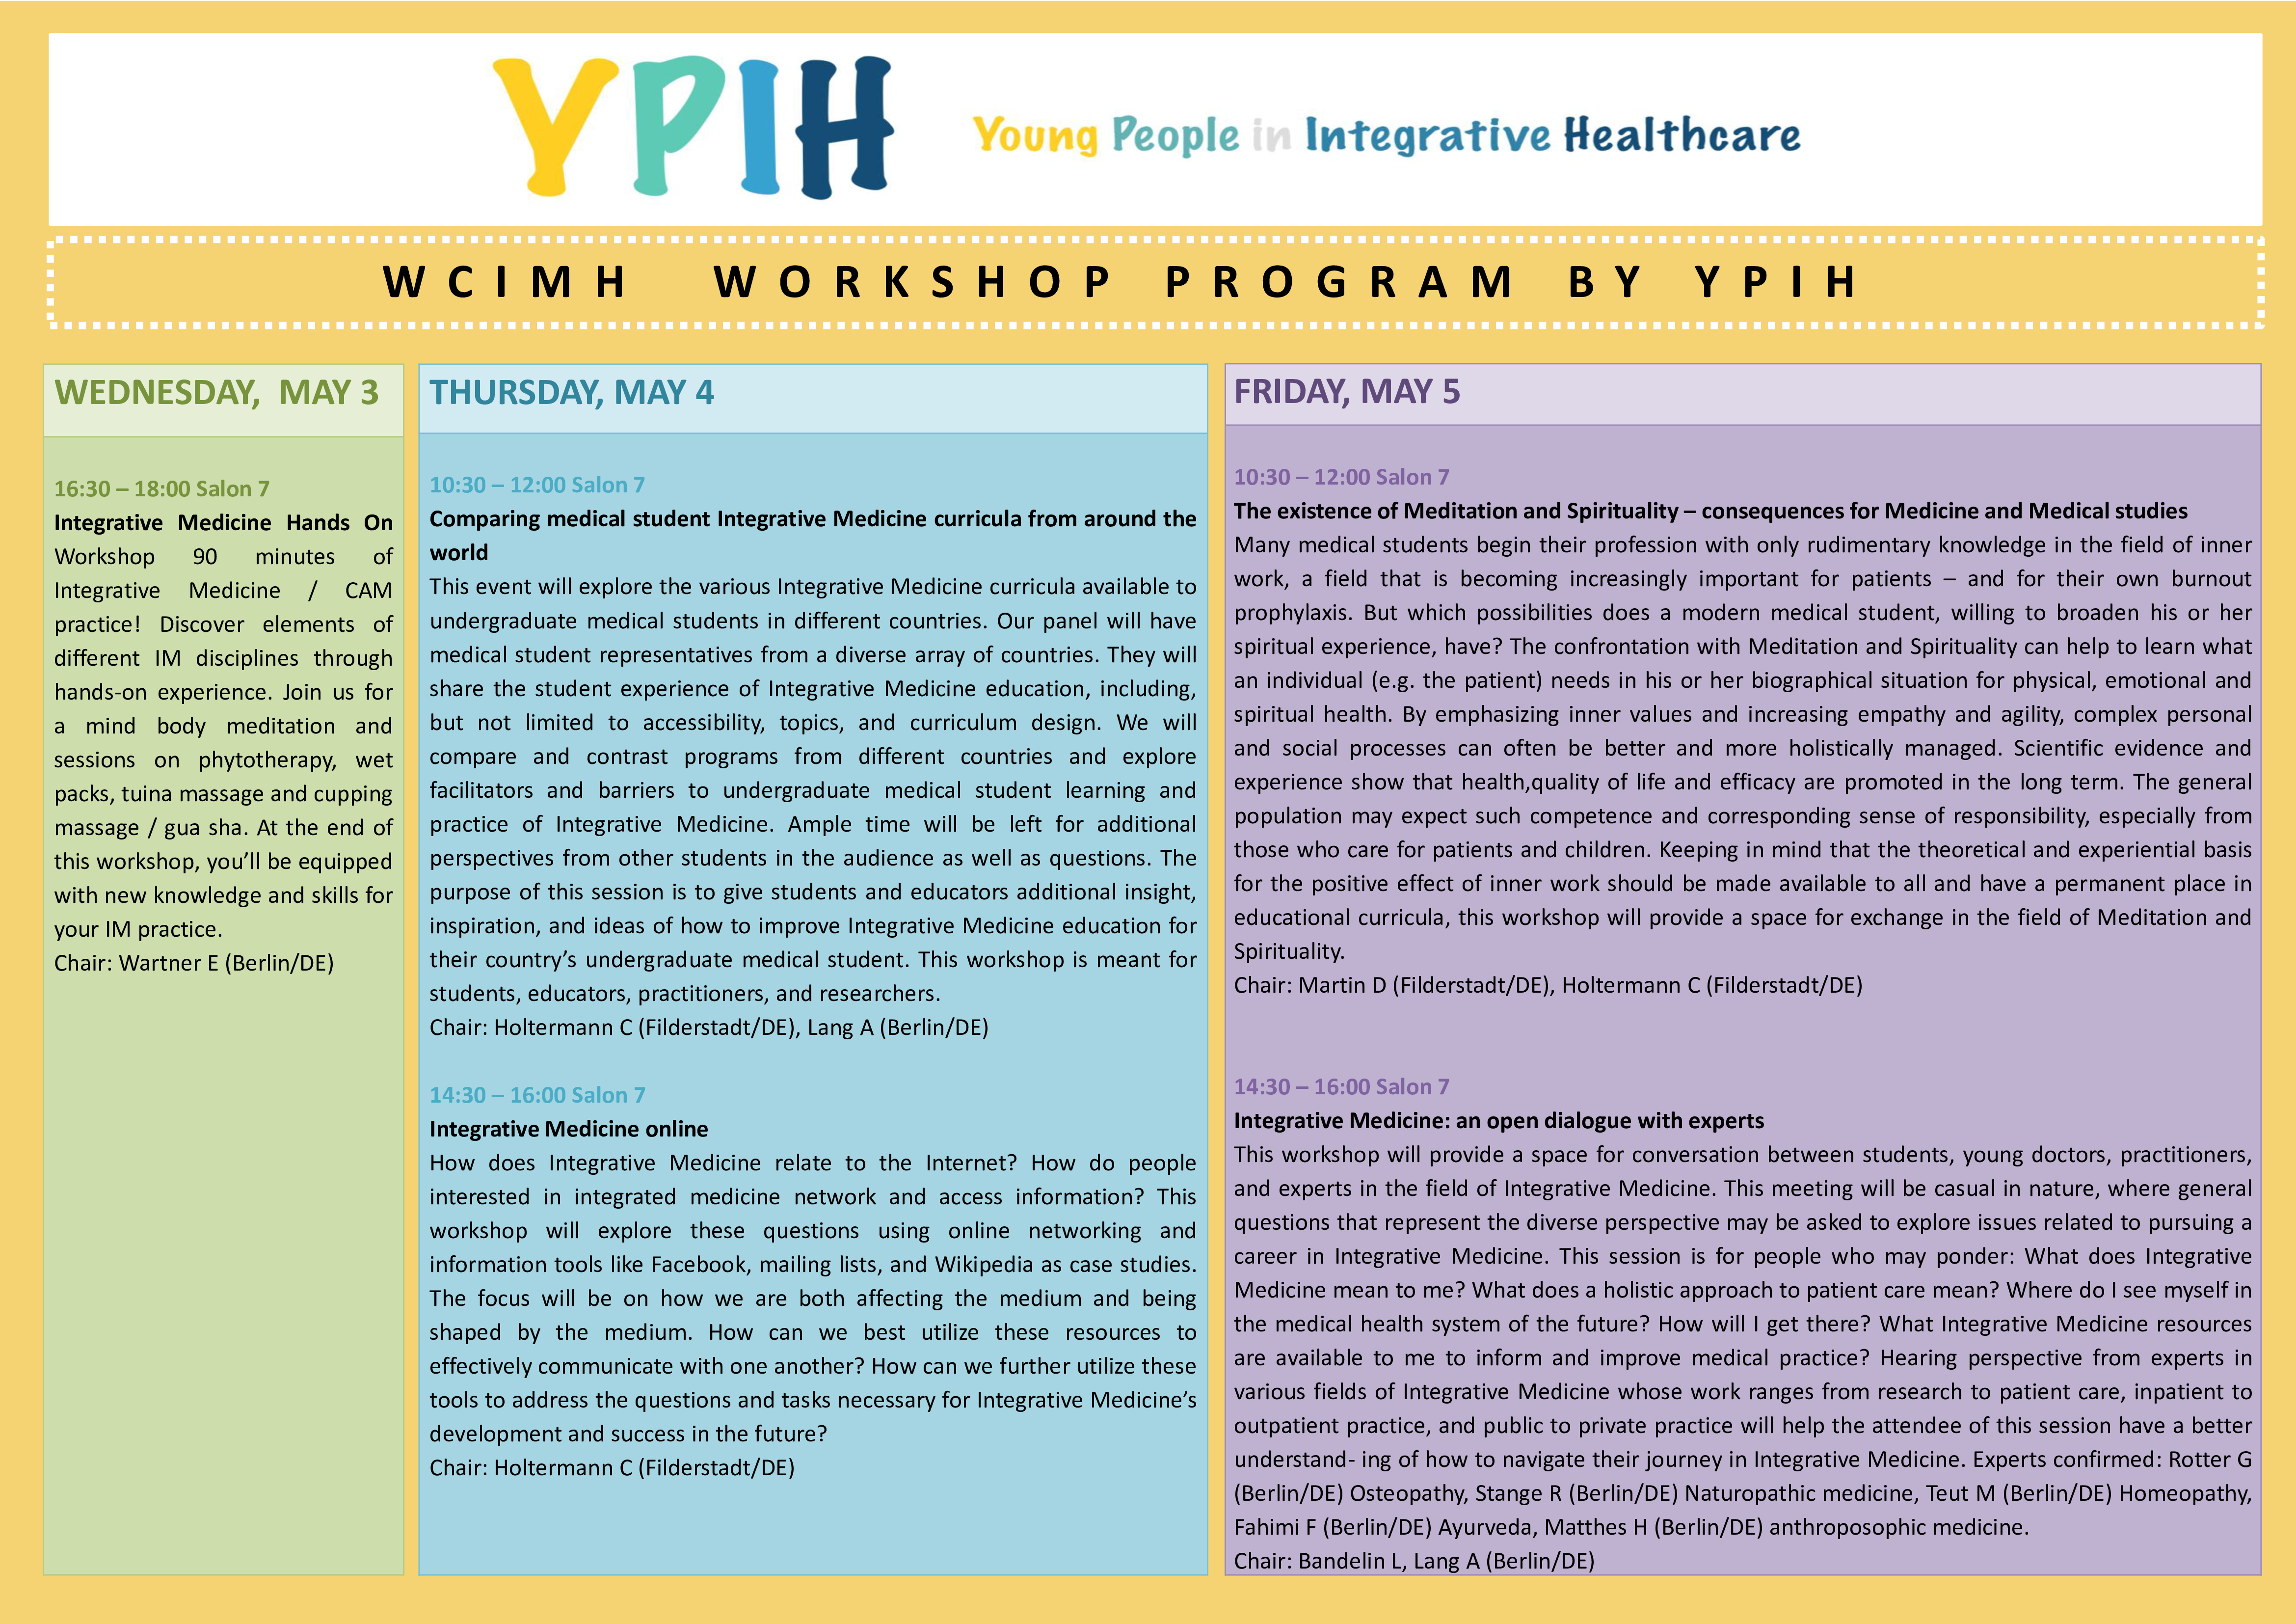 Editing File:YPIH CONGRESS PROGRAM png - ypih